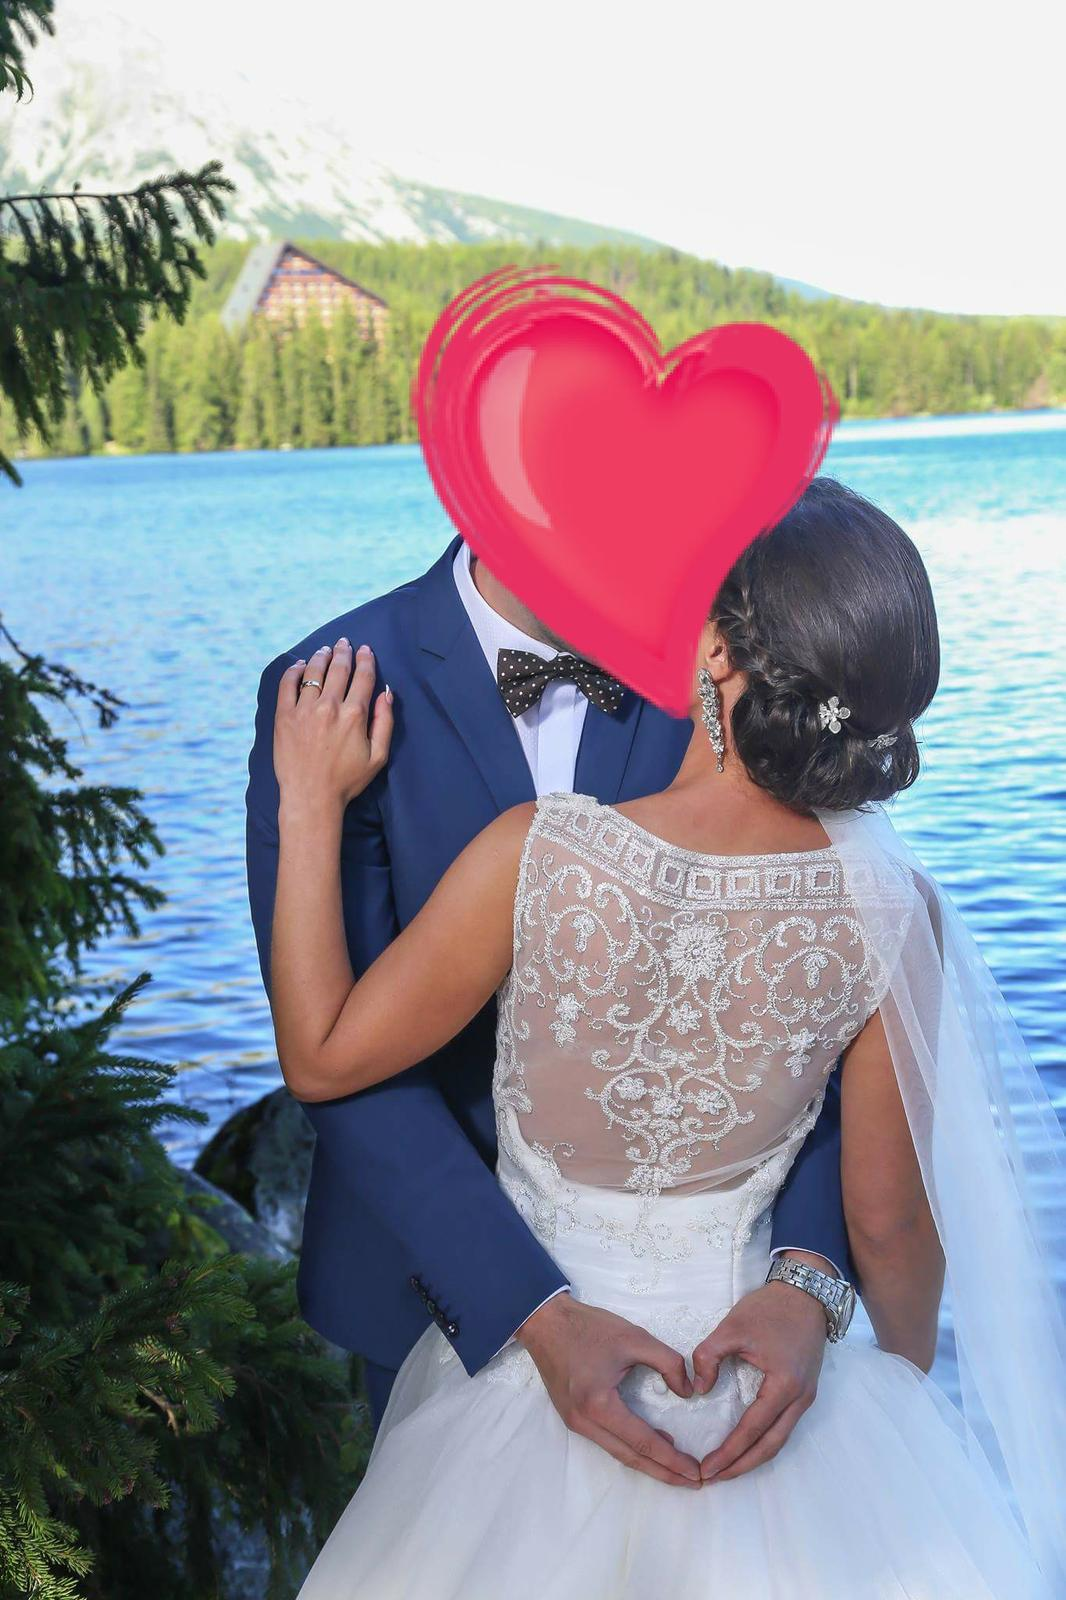 Nádherne svadobné šaty - Obrázok č. 1